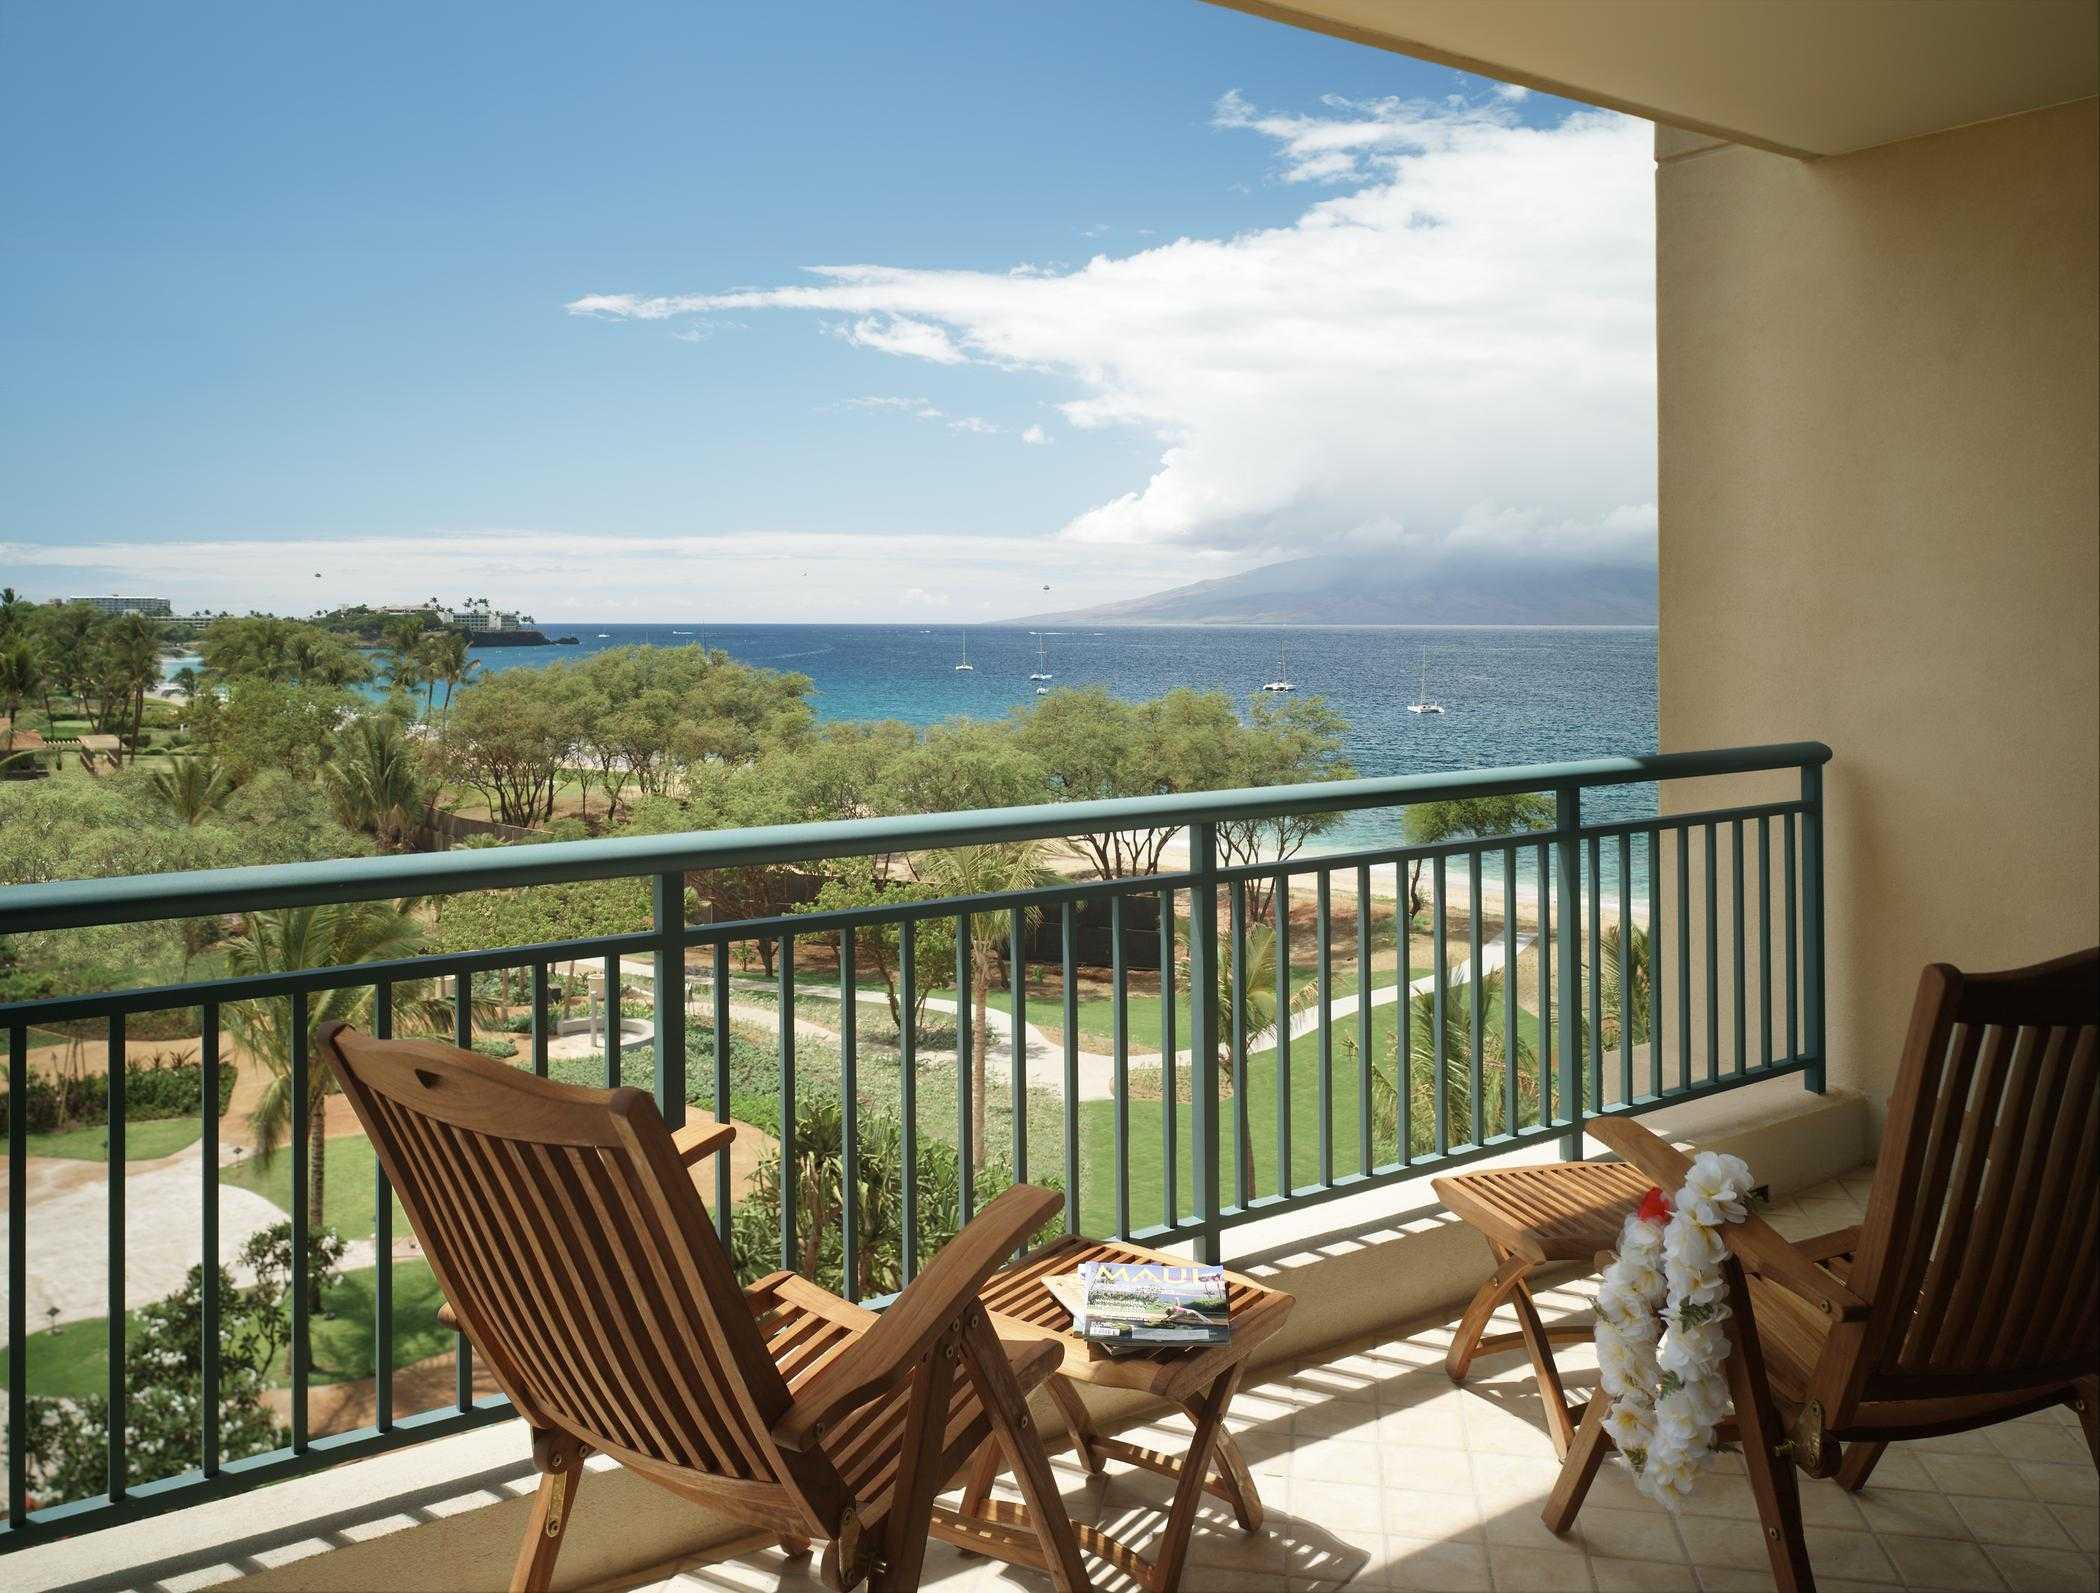 Westin Starwood Advantage Vacation Timeshare Resales